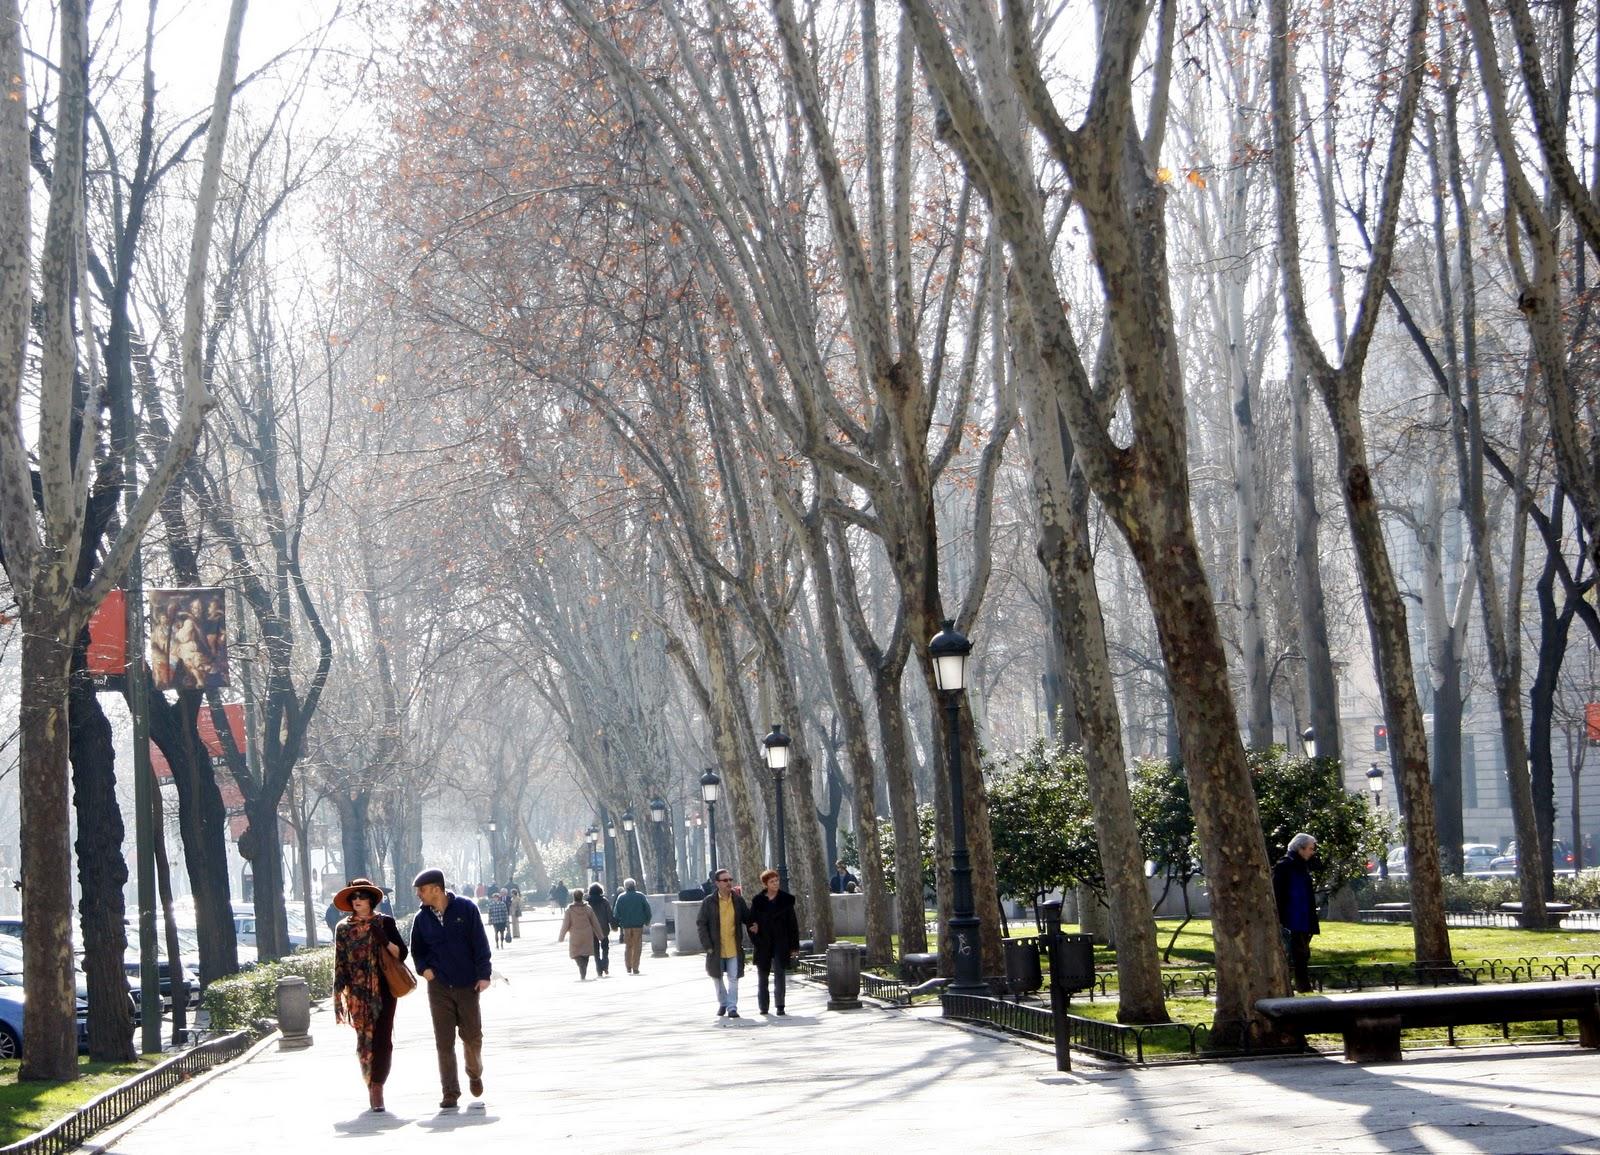 Madrid paseo del prado for Calle prado 8 madrid